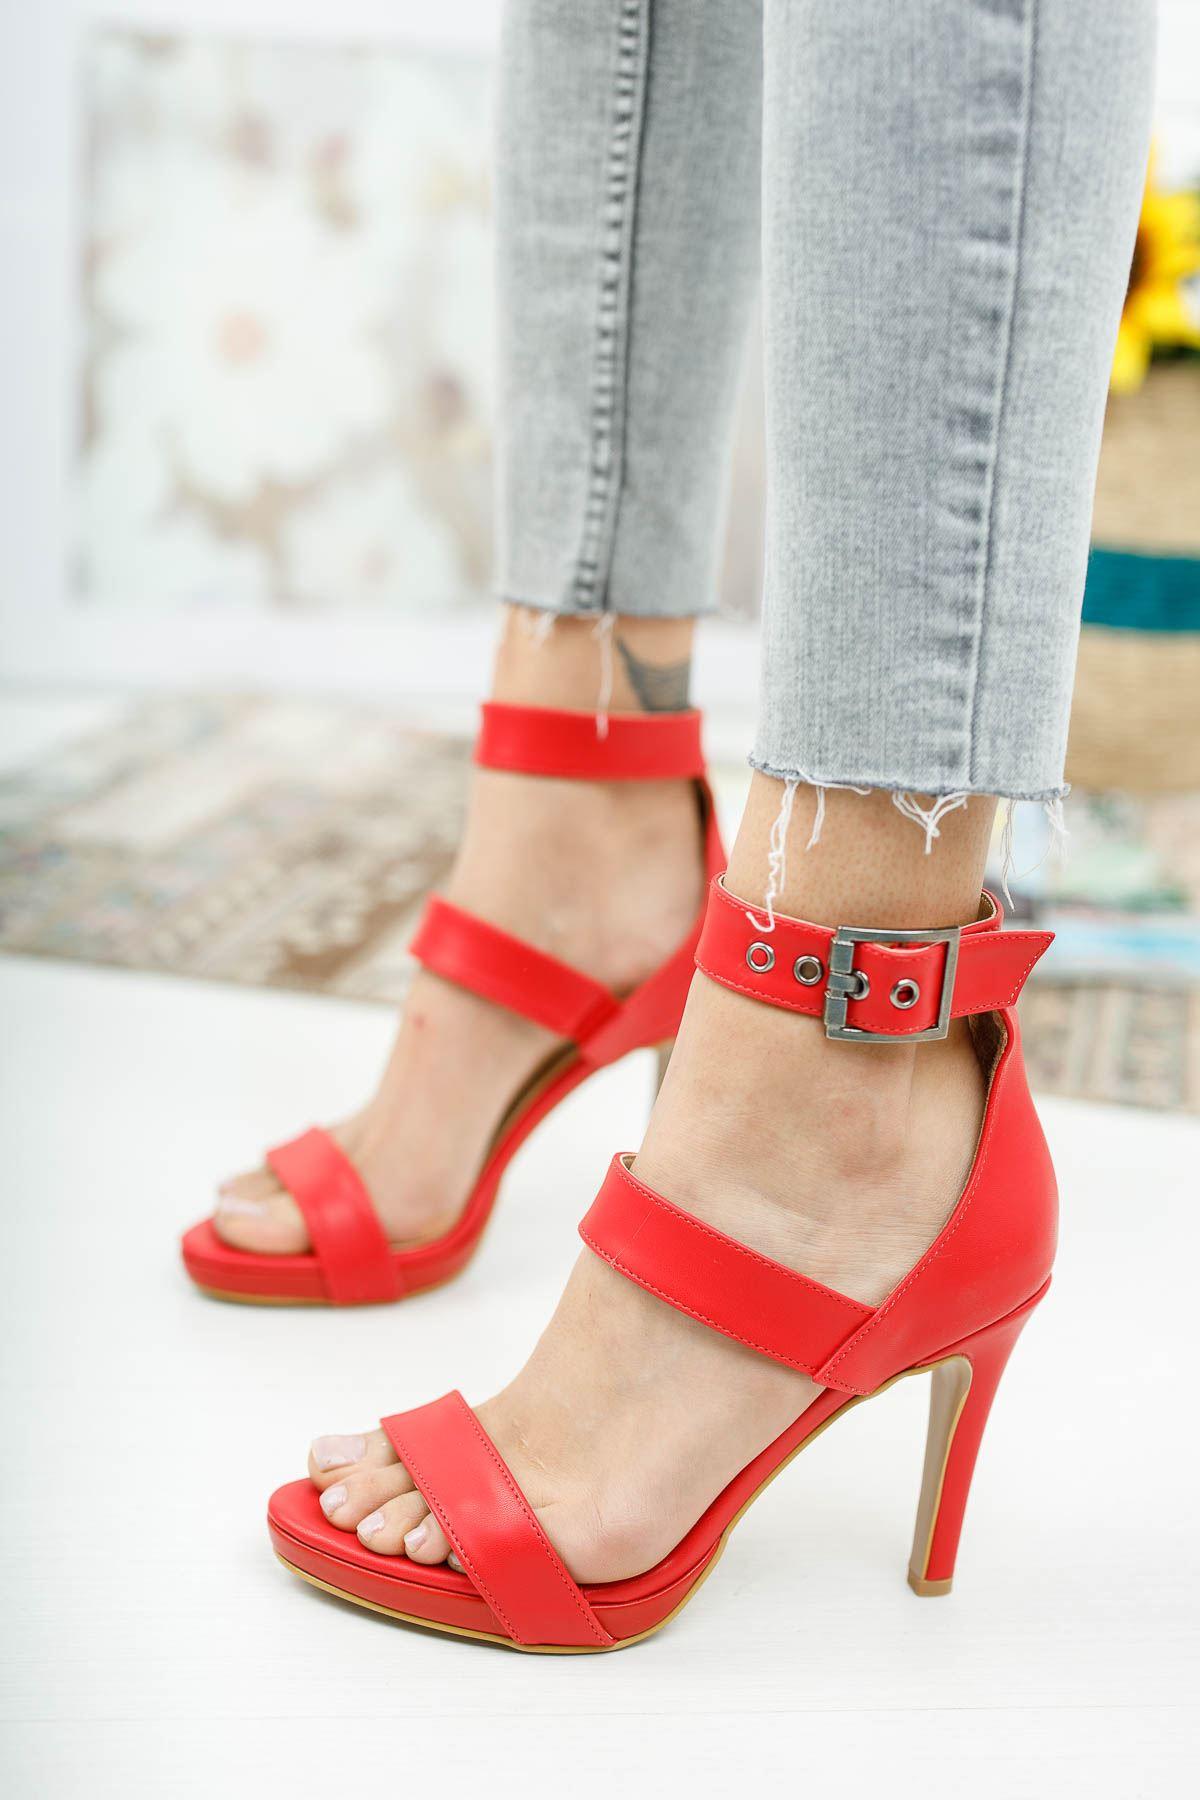 Giorgia Kırmızı Cilt Topuklu Ayakkabı